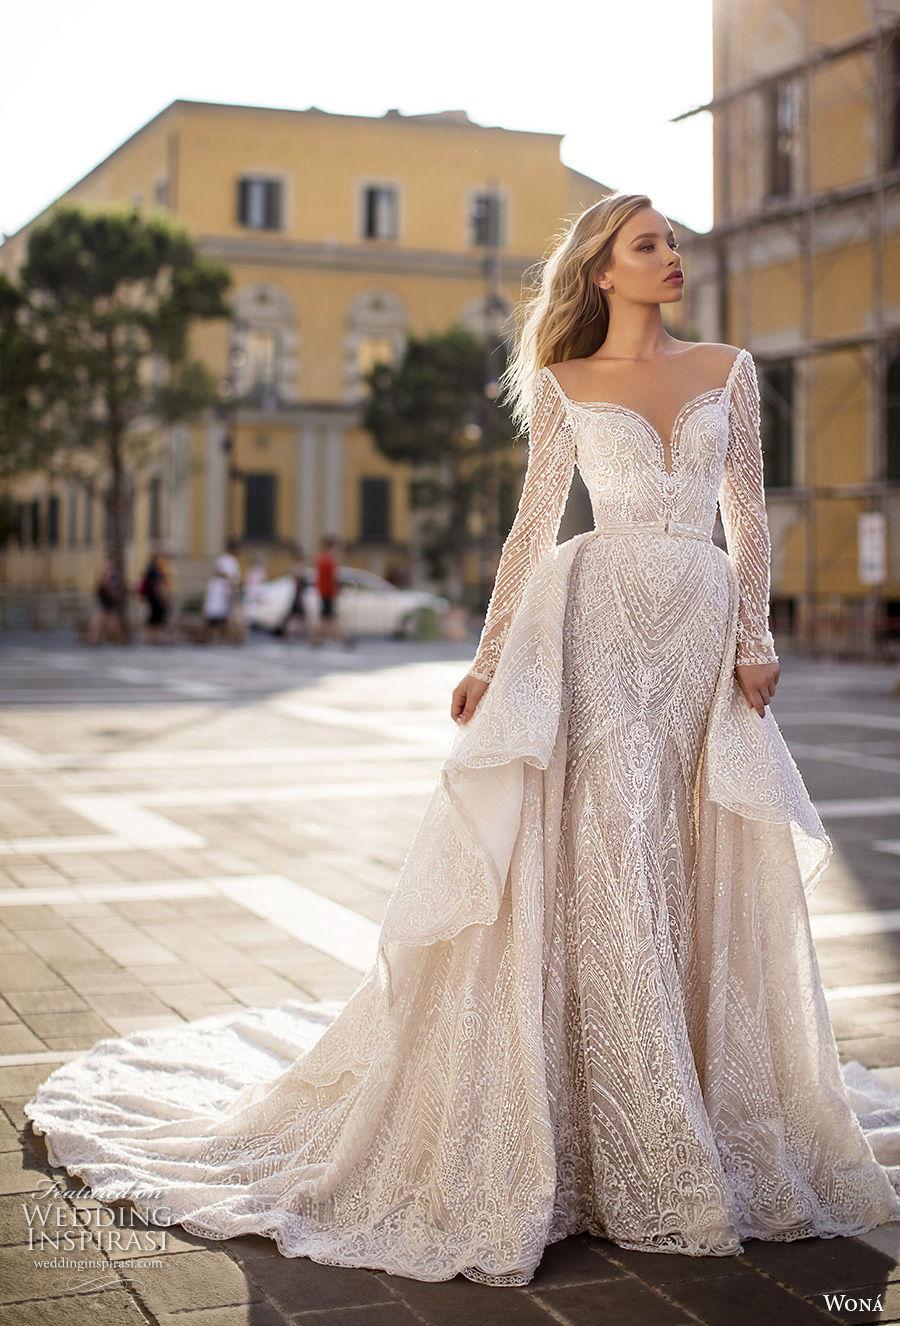 wona 2020 couture bridal long sleeves deep sweetheart neckline full embellishment elegant glamorous fit and flare sheath wedding dress a  line overskirt backless scoop back chapel train (12) mv